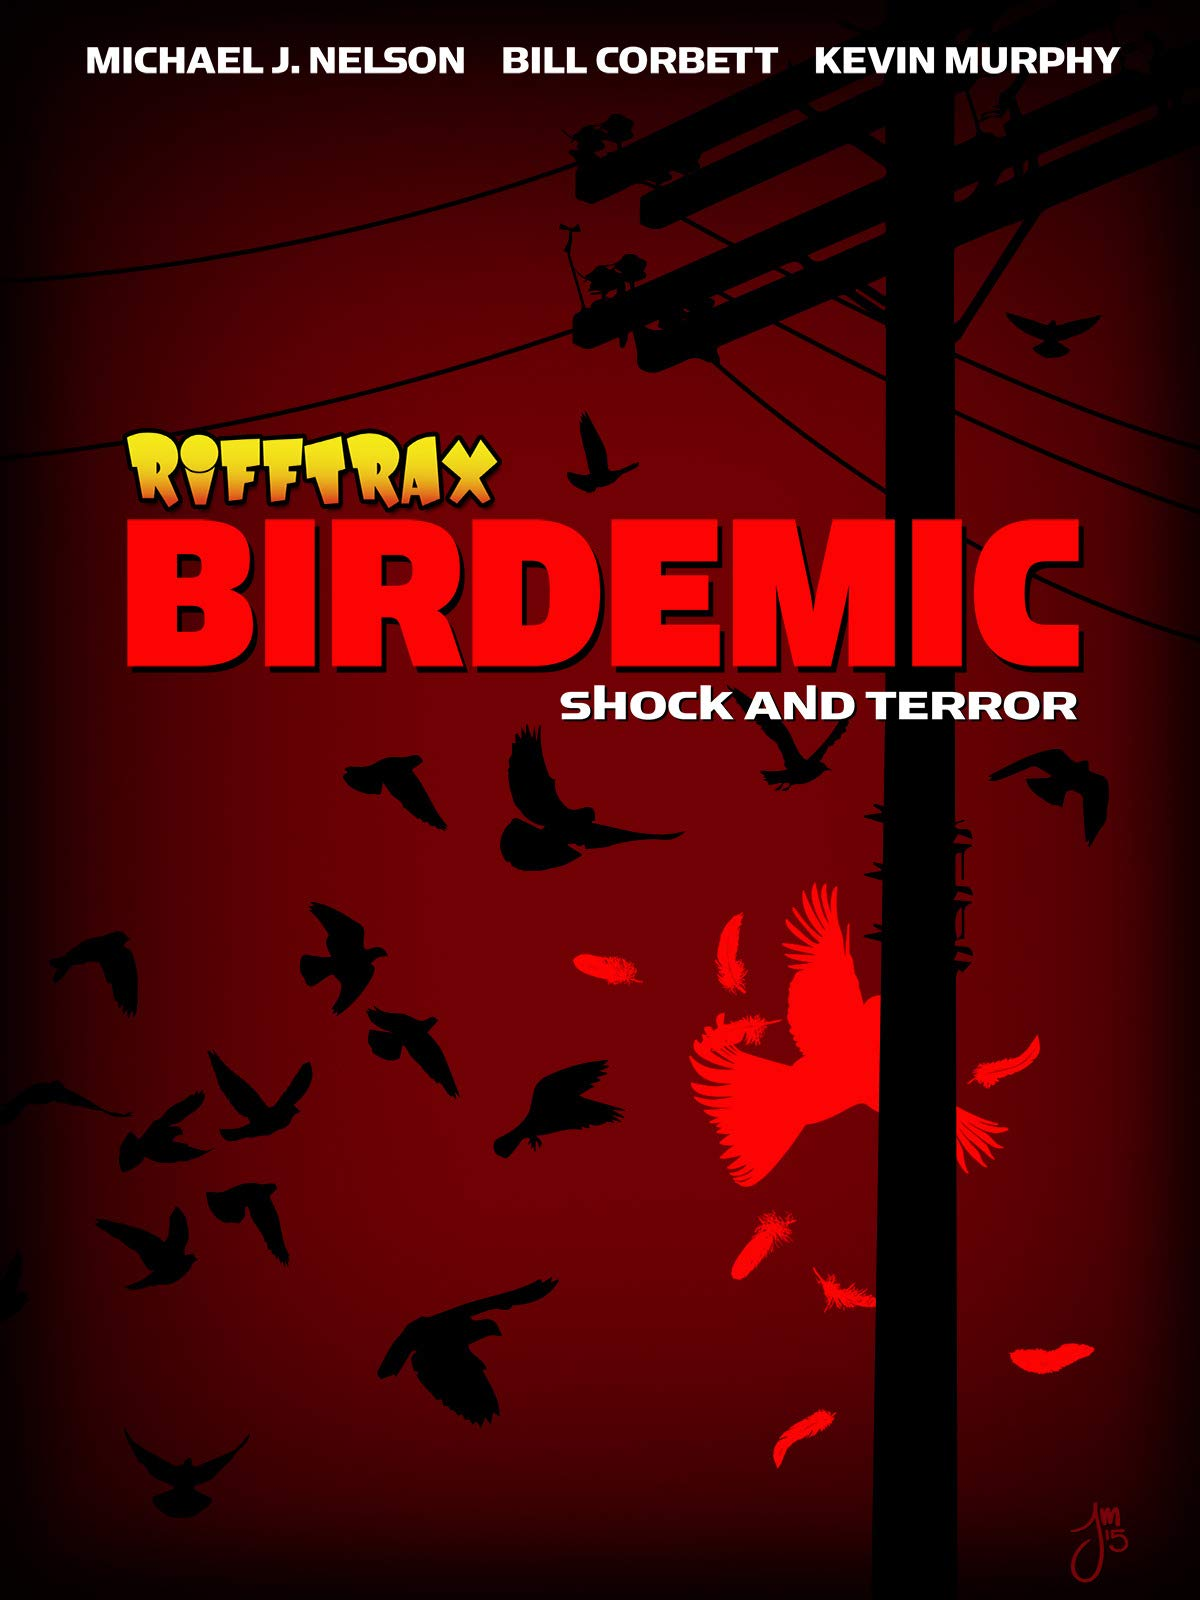 RiffTrax: Birdemic Shock and Terror